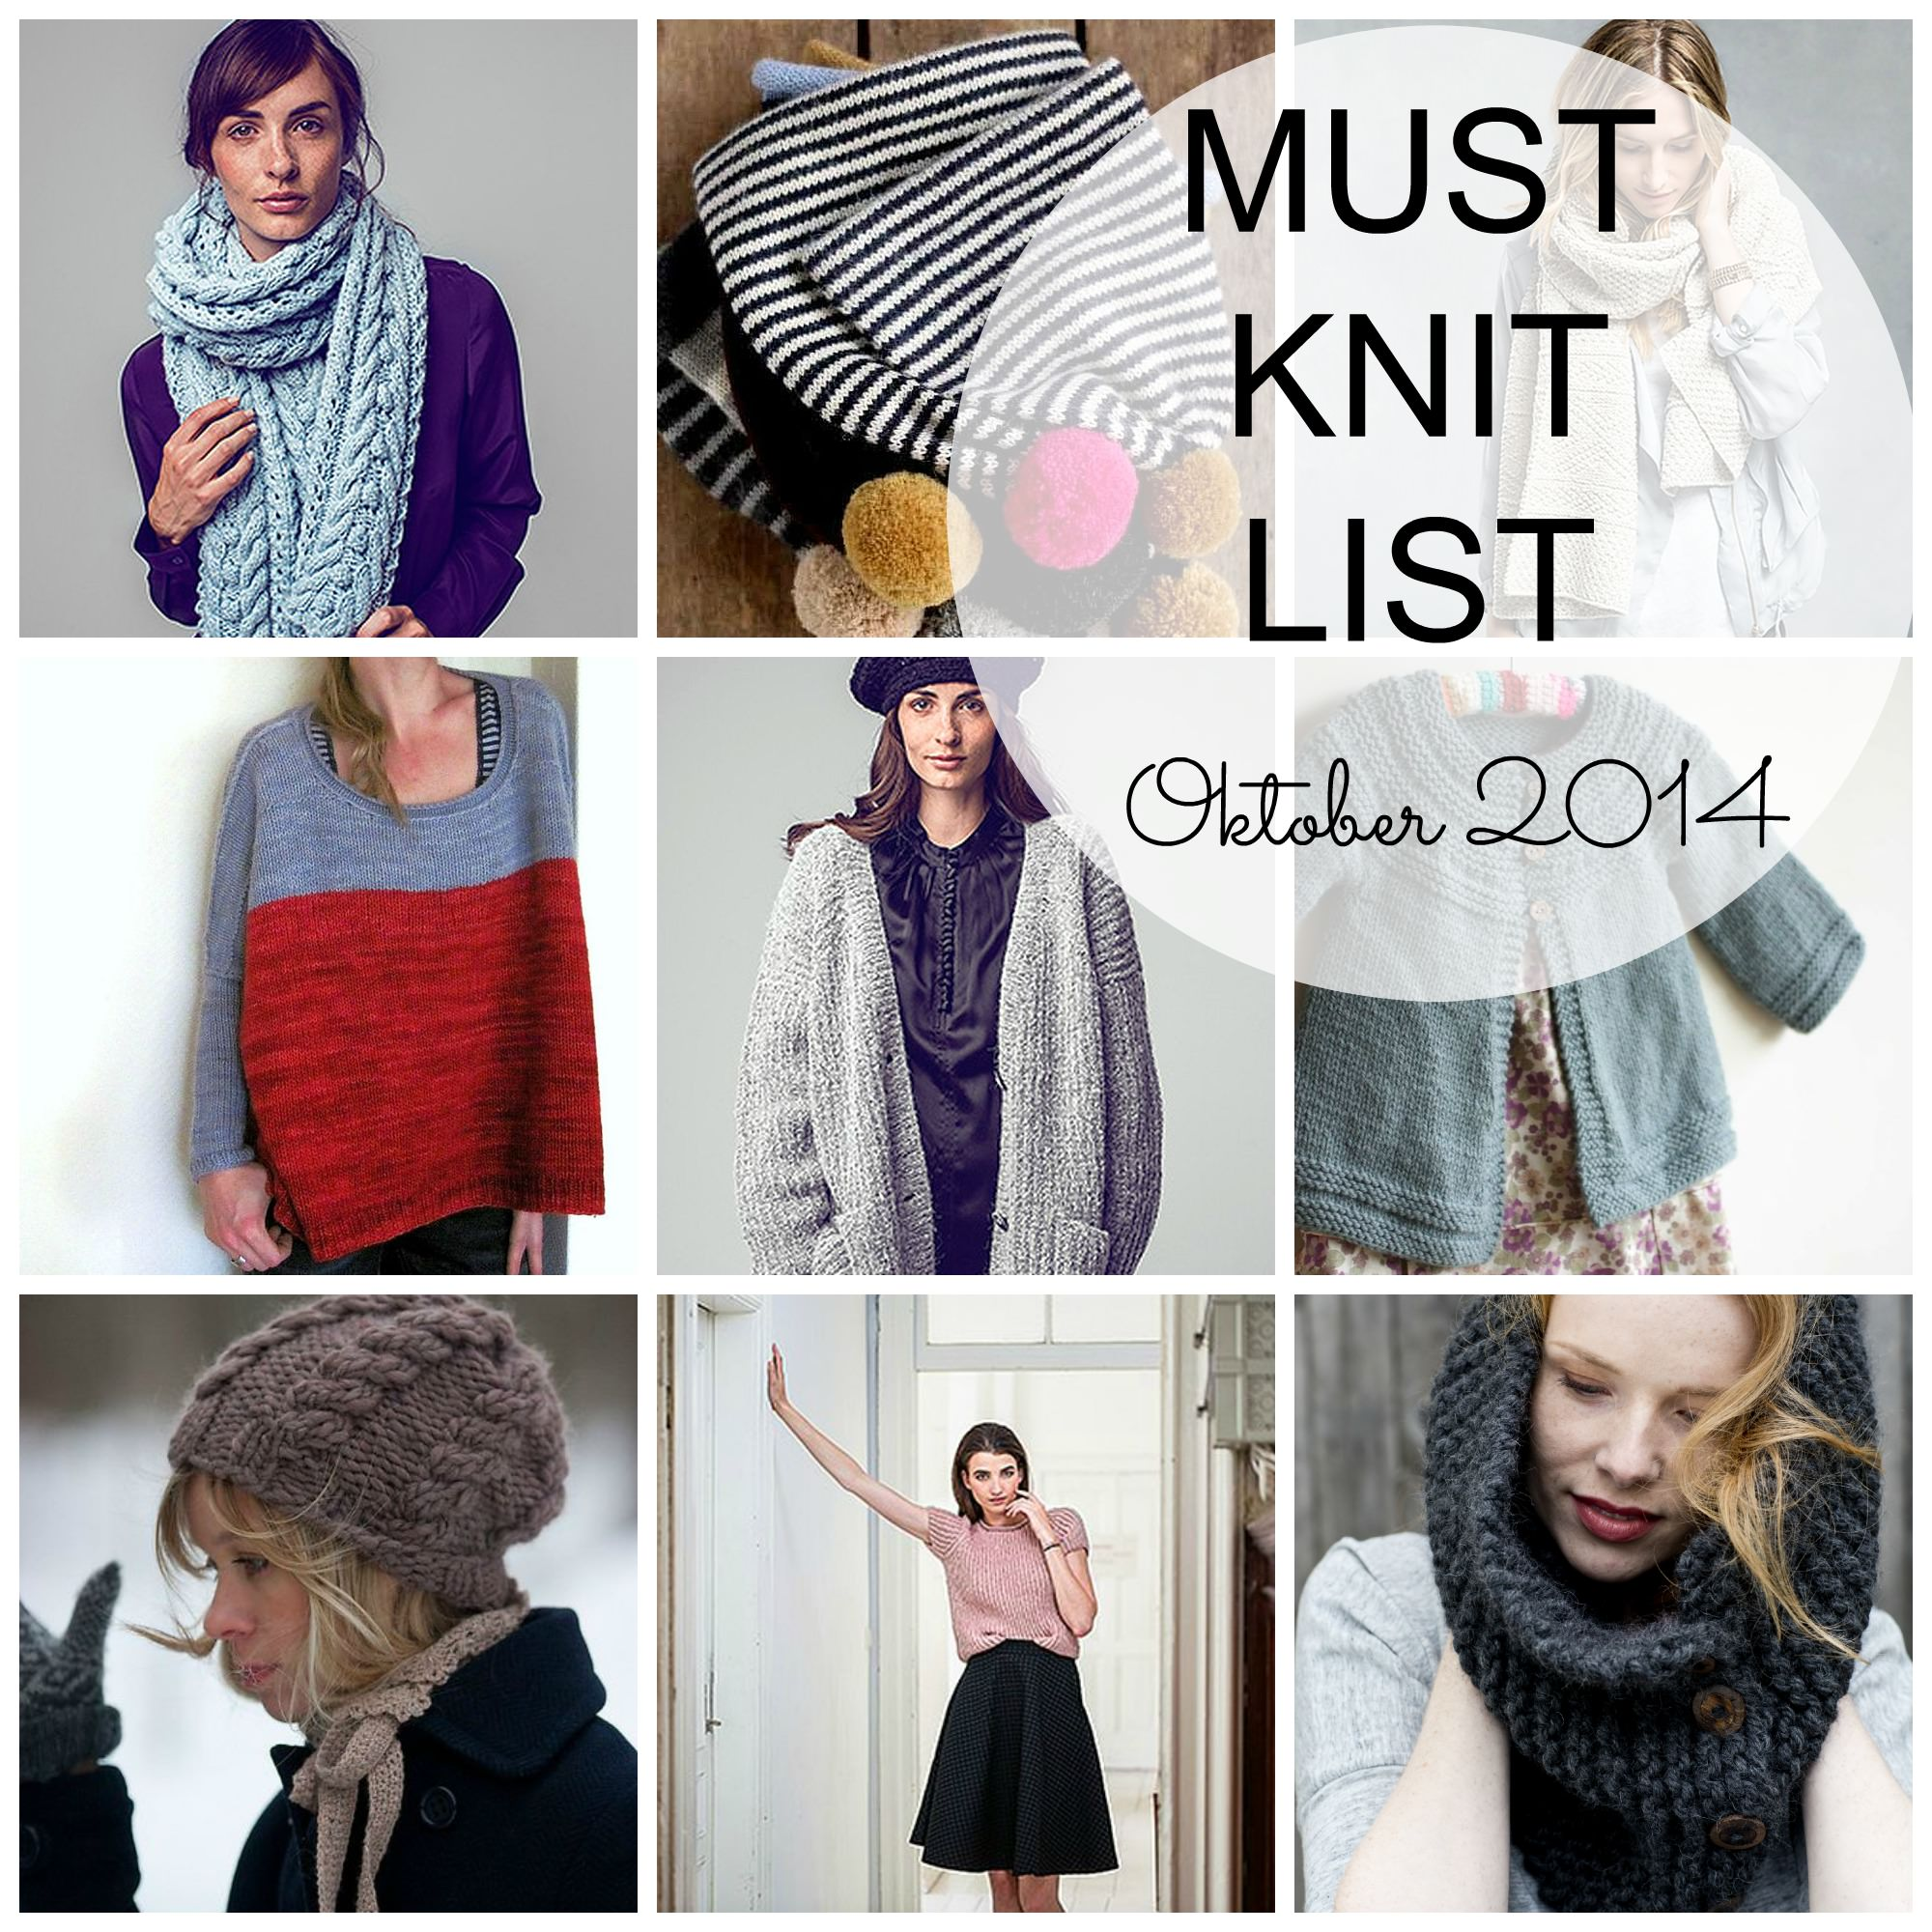 Must Knit Liste Oktober 2014 schoenstricken.de